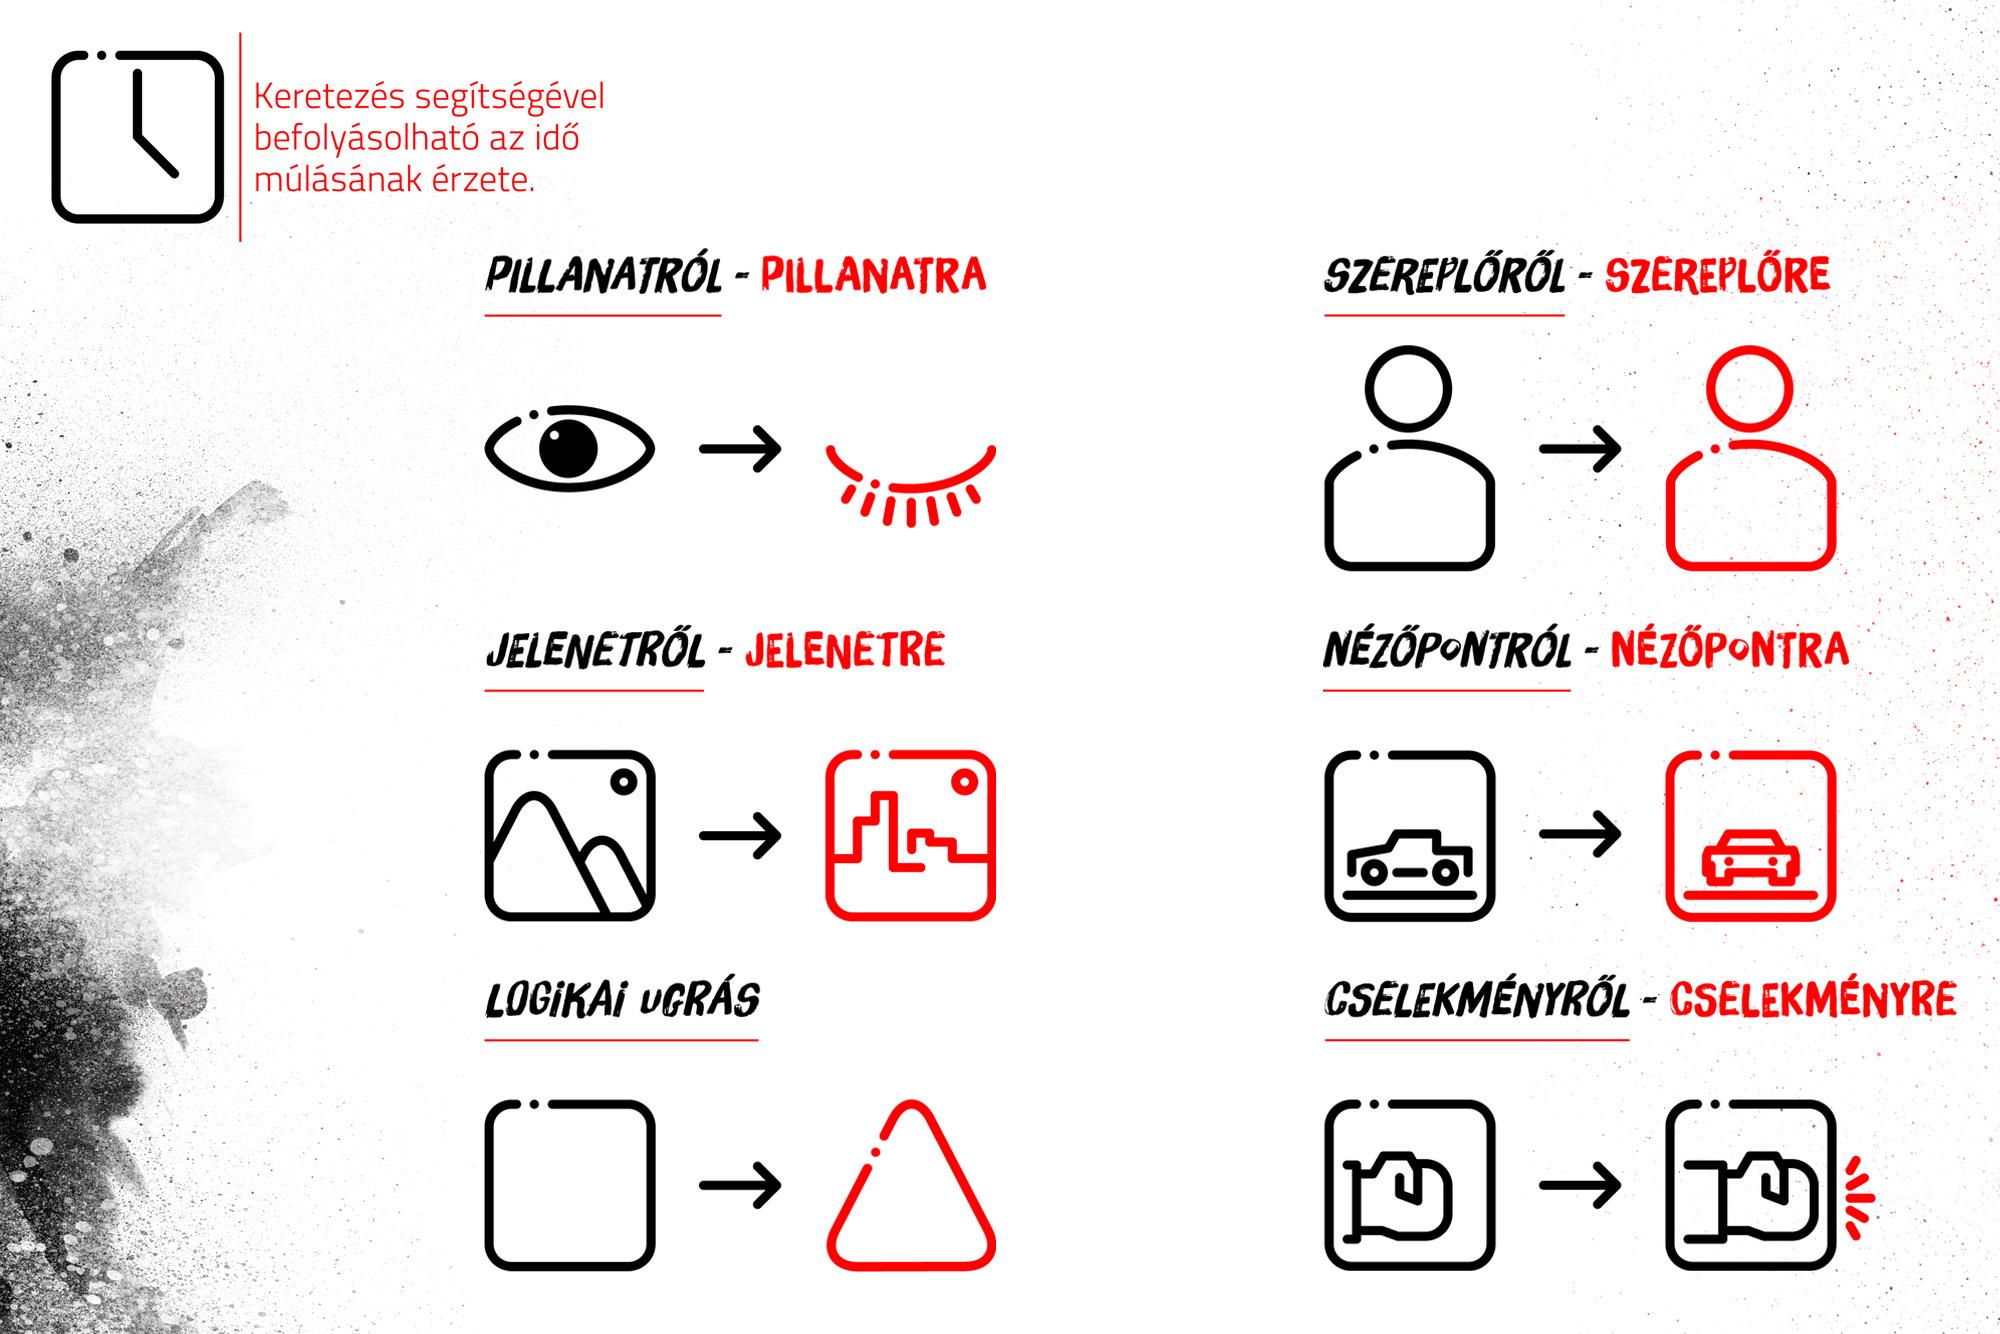 vb_akhilleusz_hellodesign design diploma_11.jpg